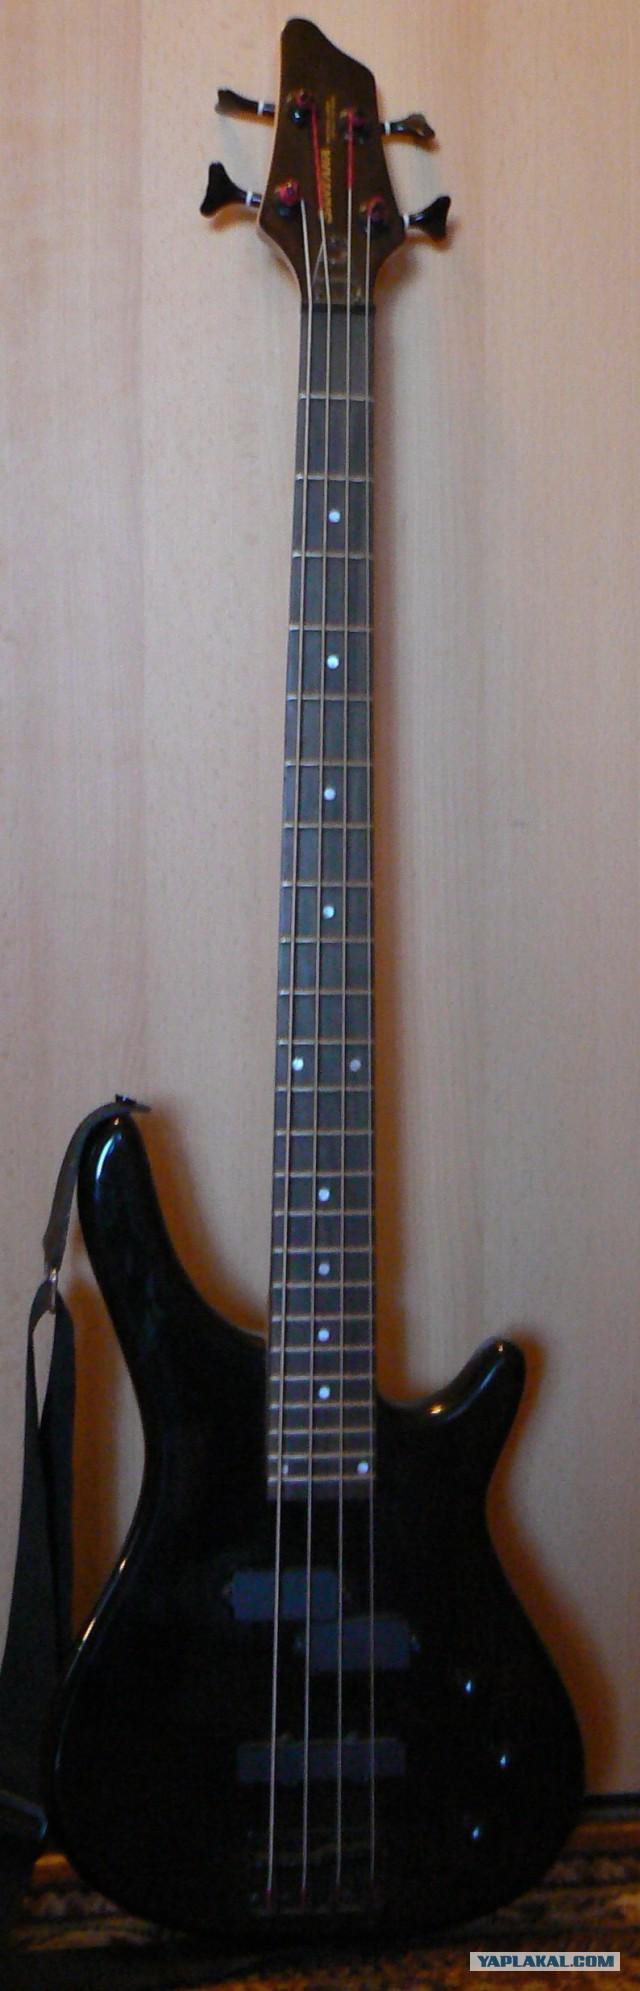 Бас гитара (Santana;пр-во Корея)